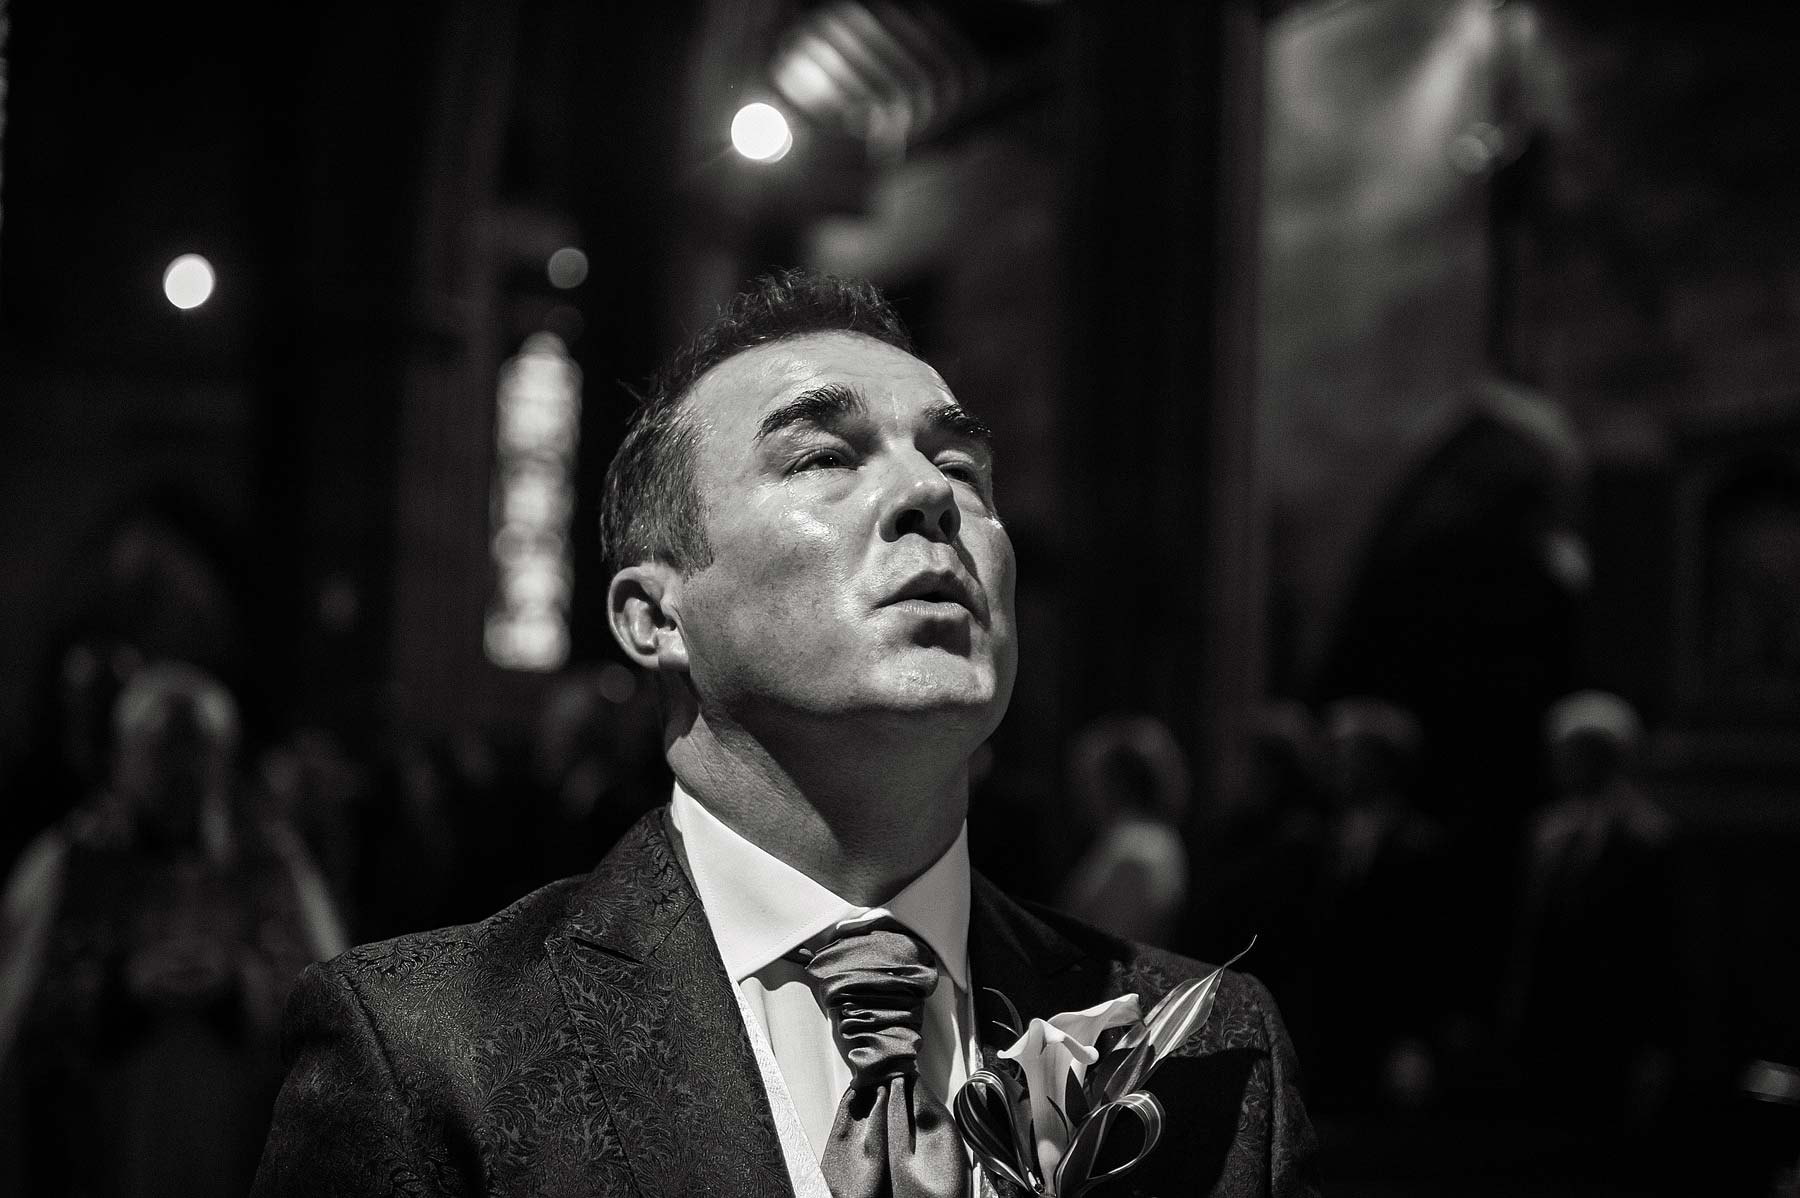 hoar-cross-hall-wedding-photographers-037